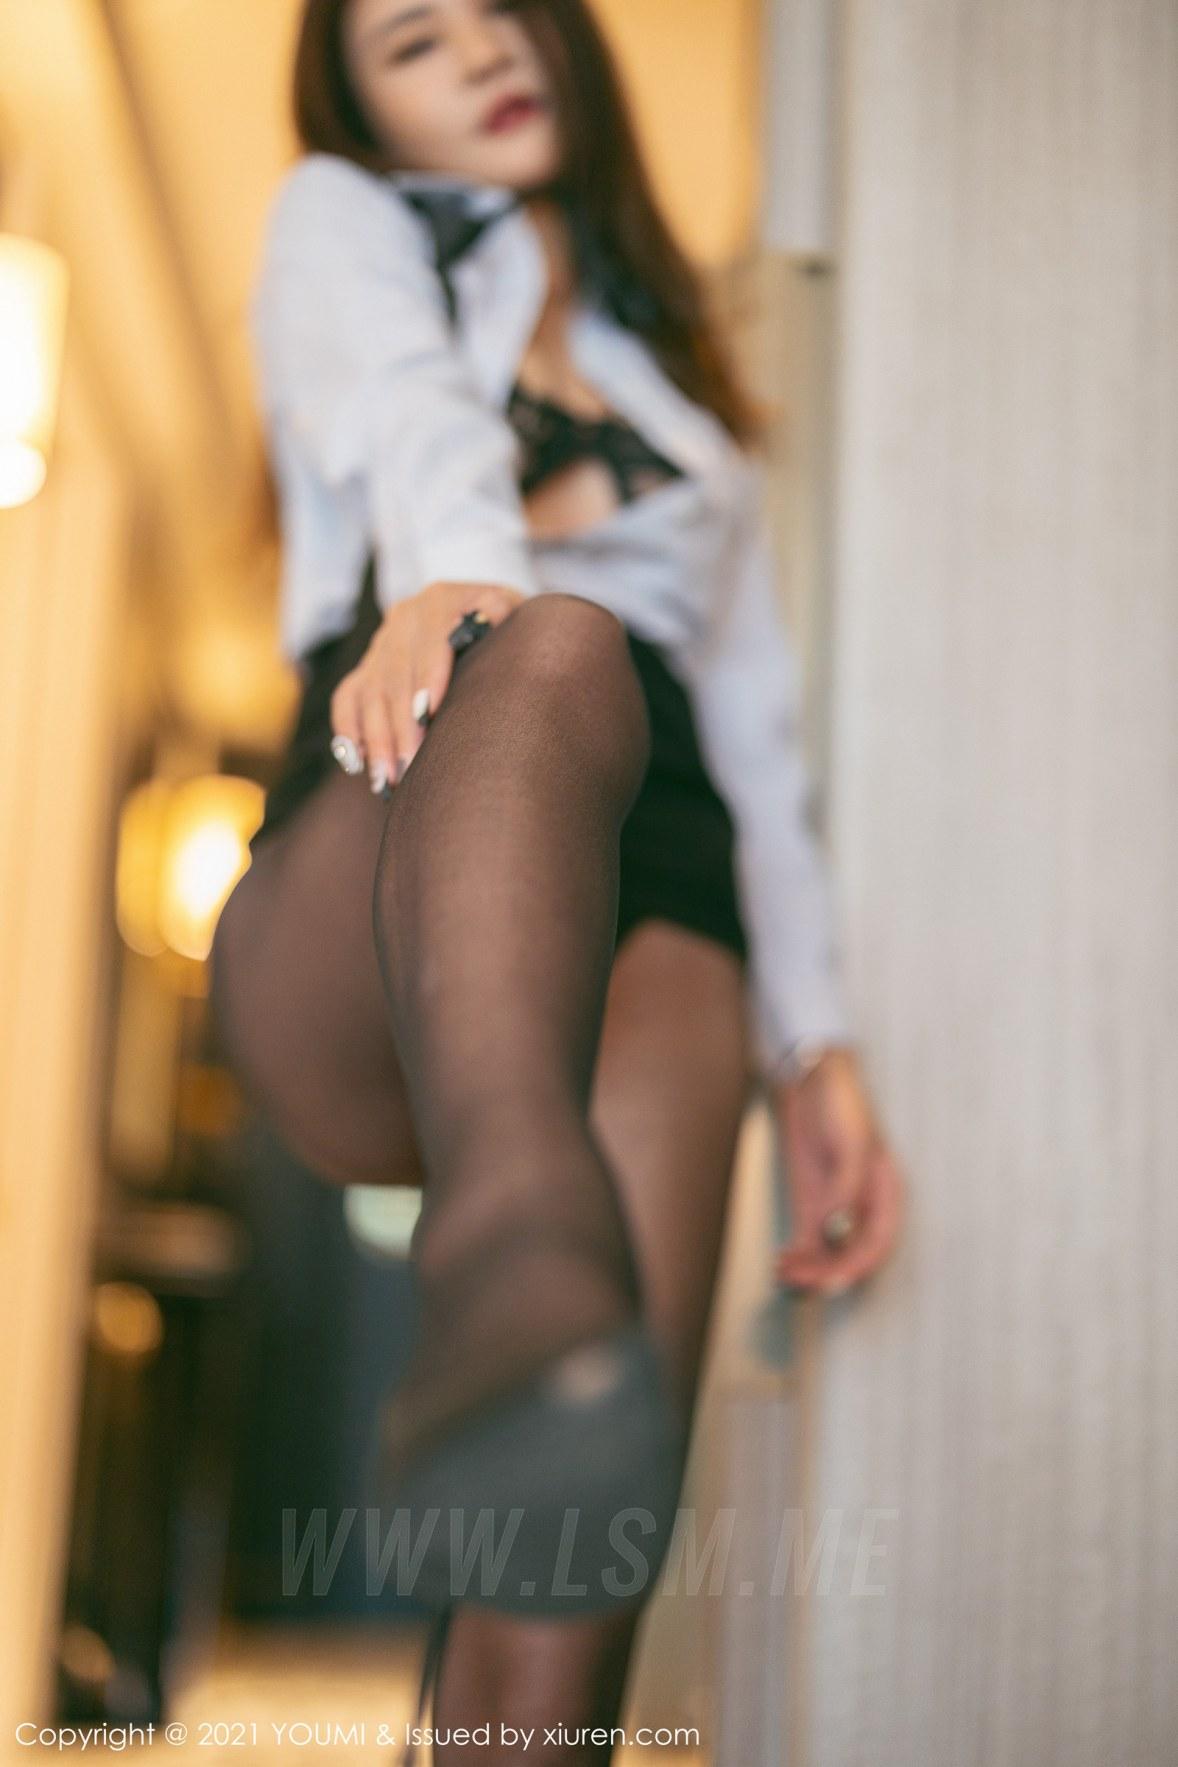 648 018 7xm 3600 5400 - YOUMI 尤蜜荟 Vol.648  镂空服饰 Emily顾奈奈 澳门旅拍 - 尤蜜荟 -【免费在线写真】【丽人丝语】